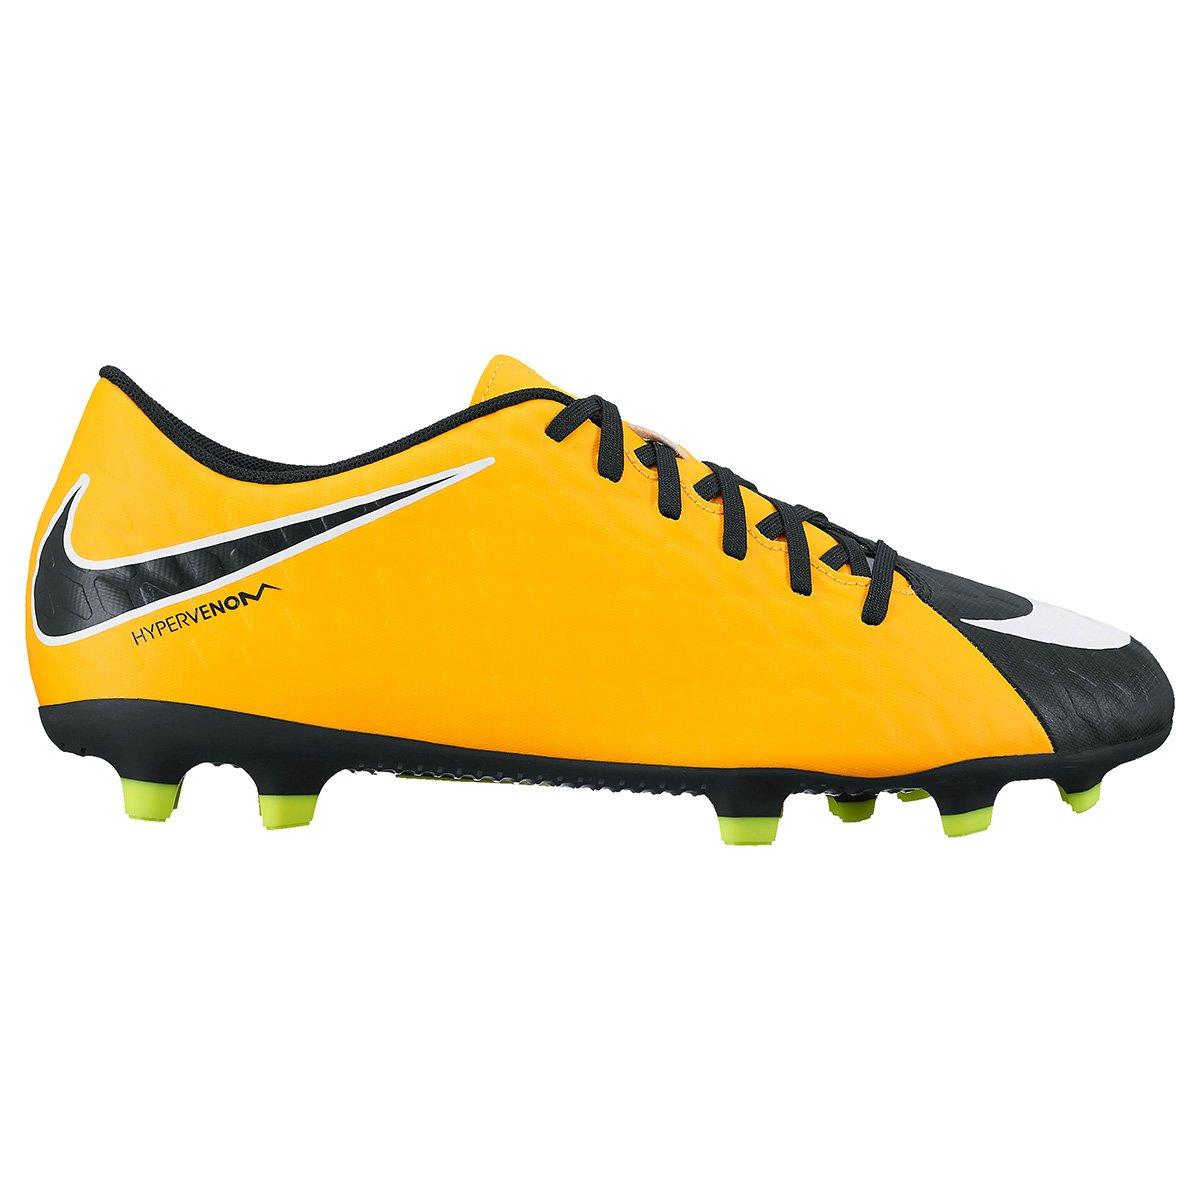 Chuteira Campo Nike Hypervenom Phade 3 FG - Compre Agora  5d1a32d616bb3